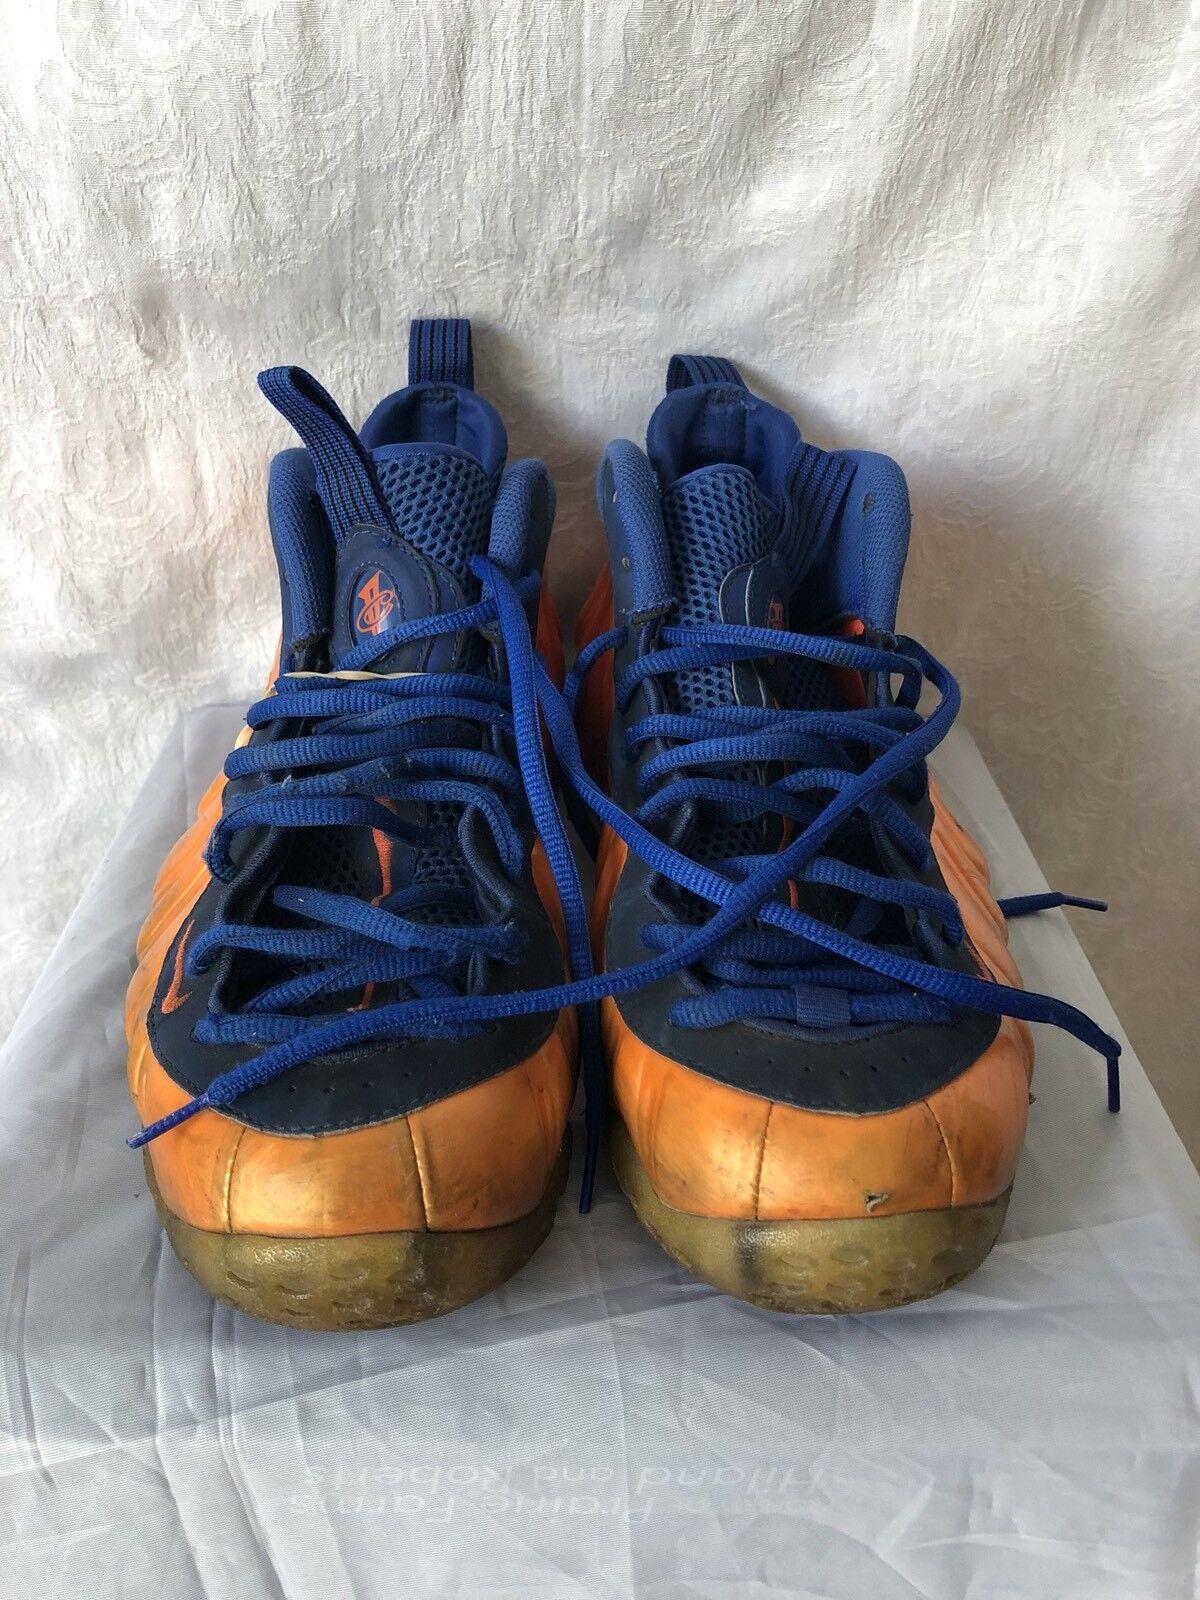 nike foamposite orange größe - blauen knicks mens größe orange 12 basketball - schuhe 314996-801 d9c28f